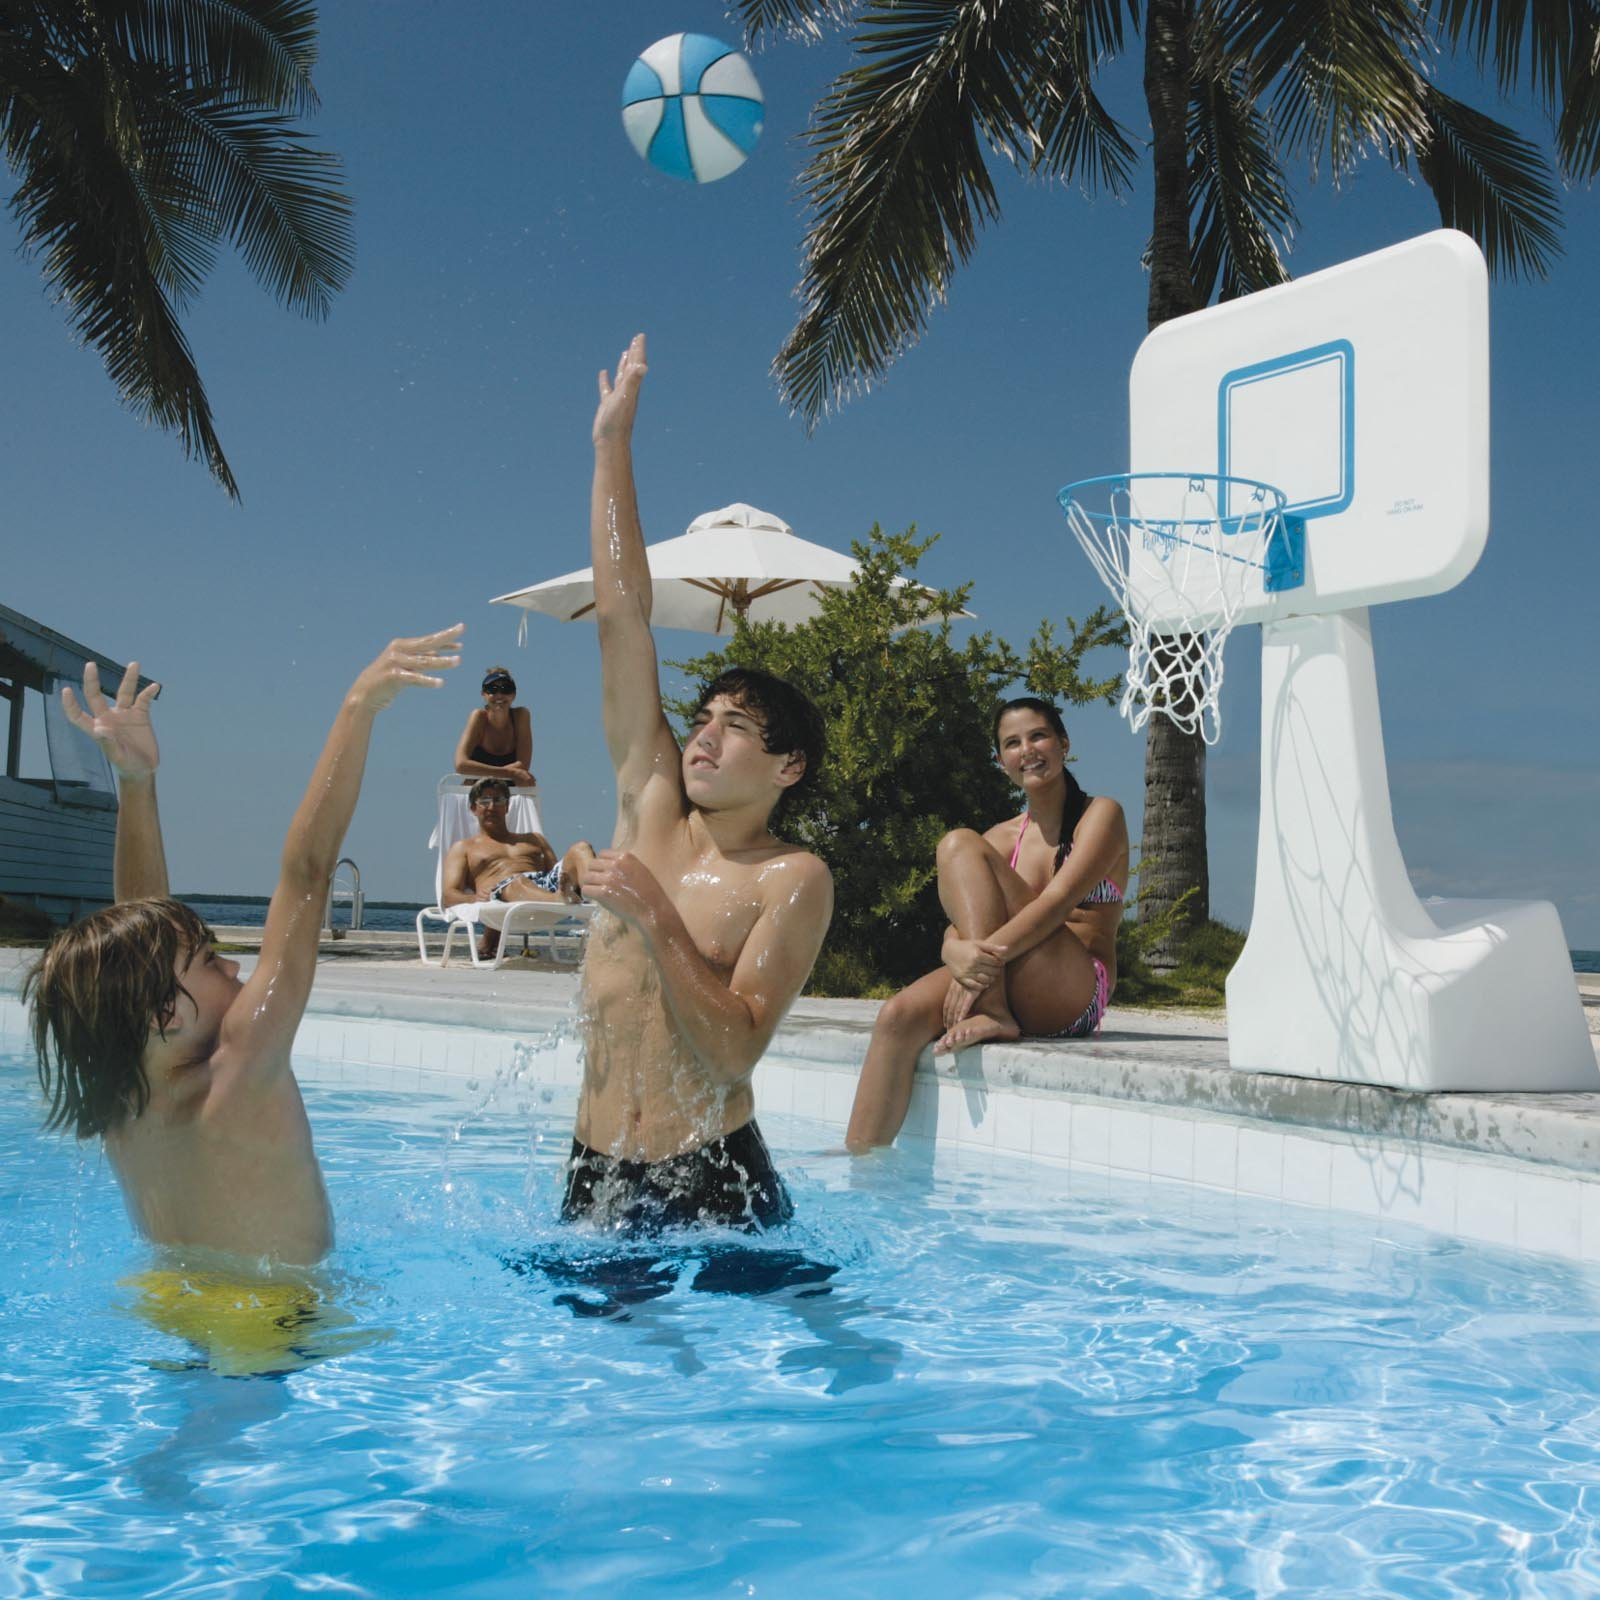 Justfun inflatables - Pool basketball ...